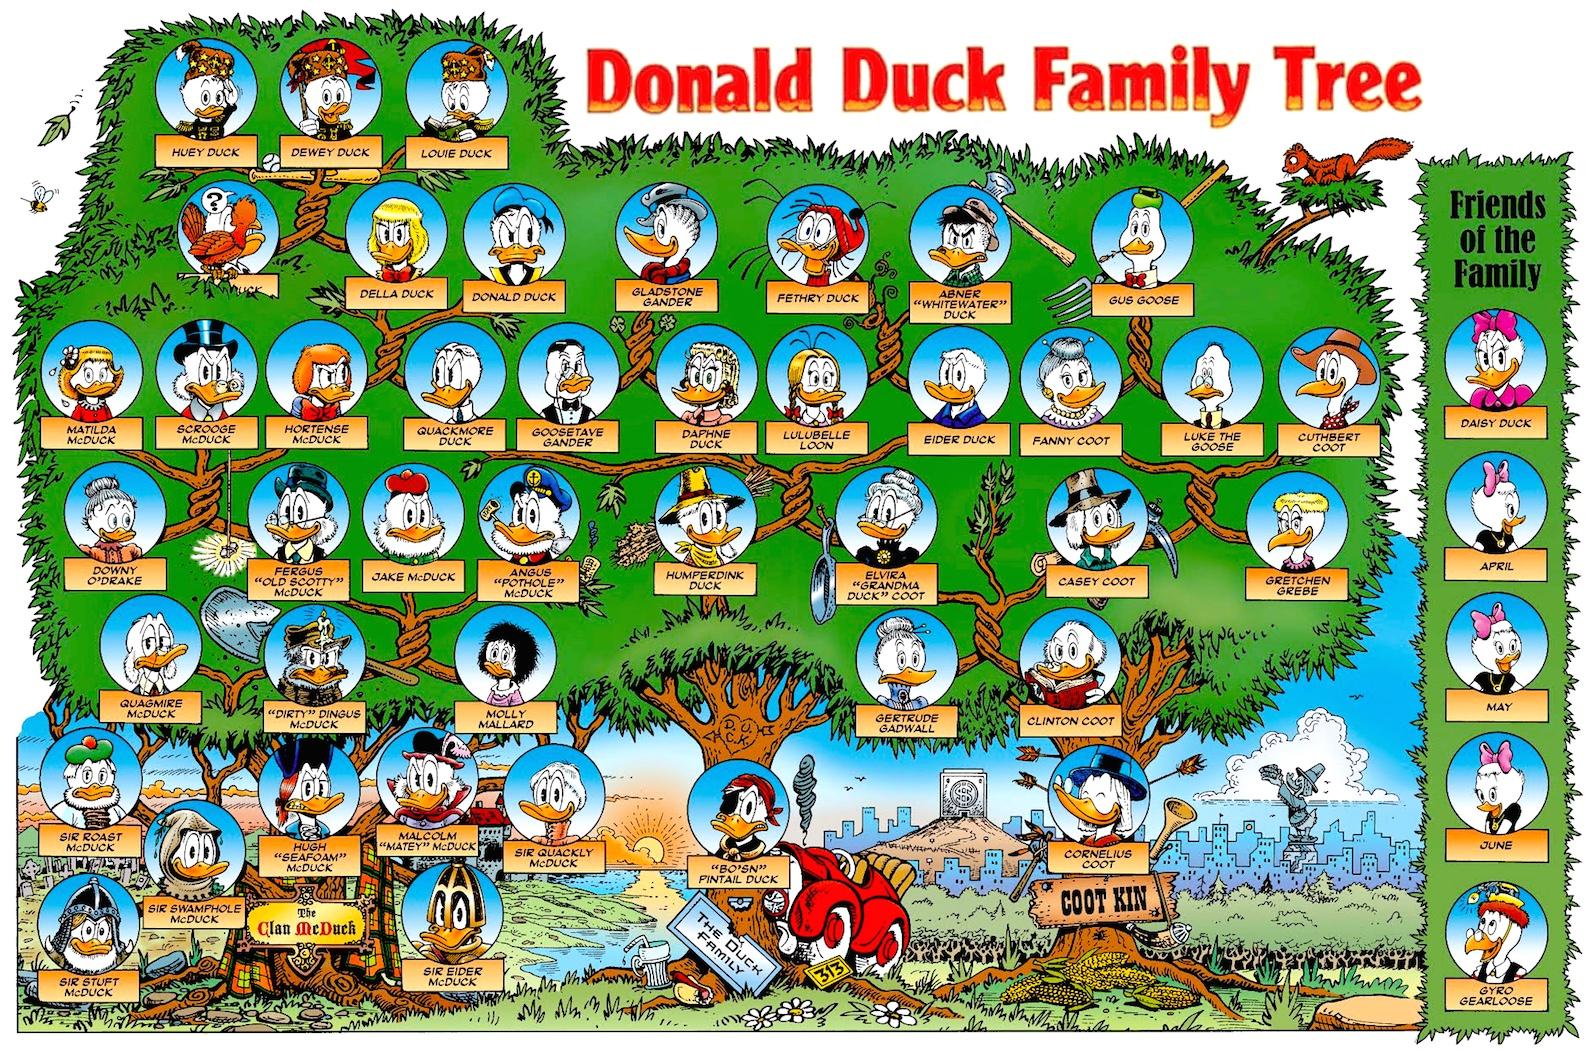 Papernik Donald Duck: The Duck Avenger (Comic Books) Infographic